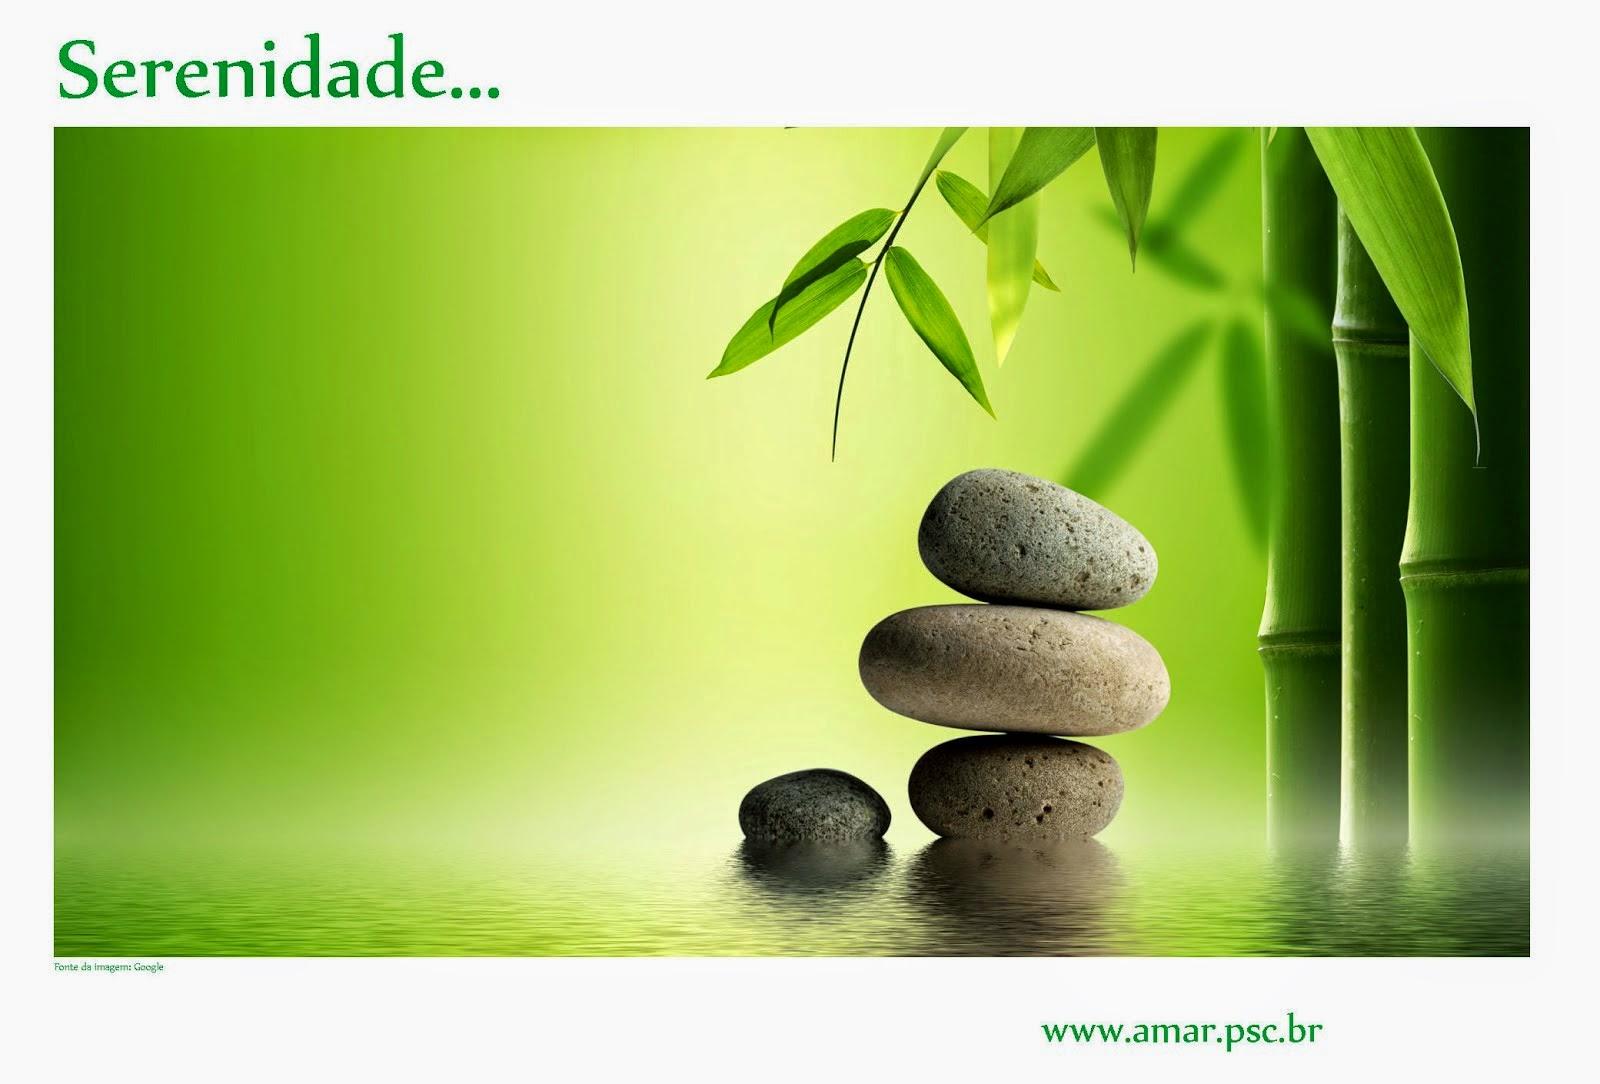 Serenidade, seja bem-vinda!